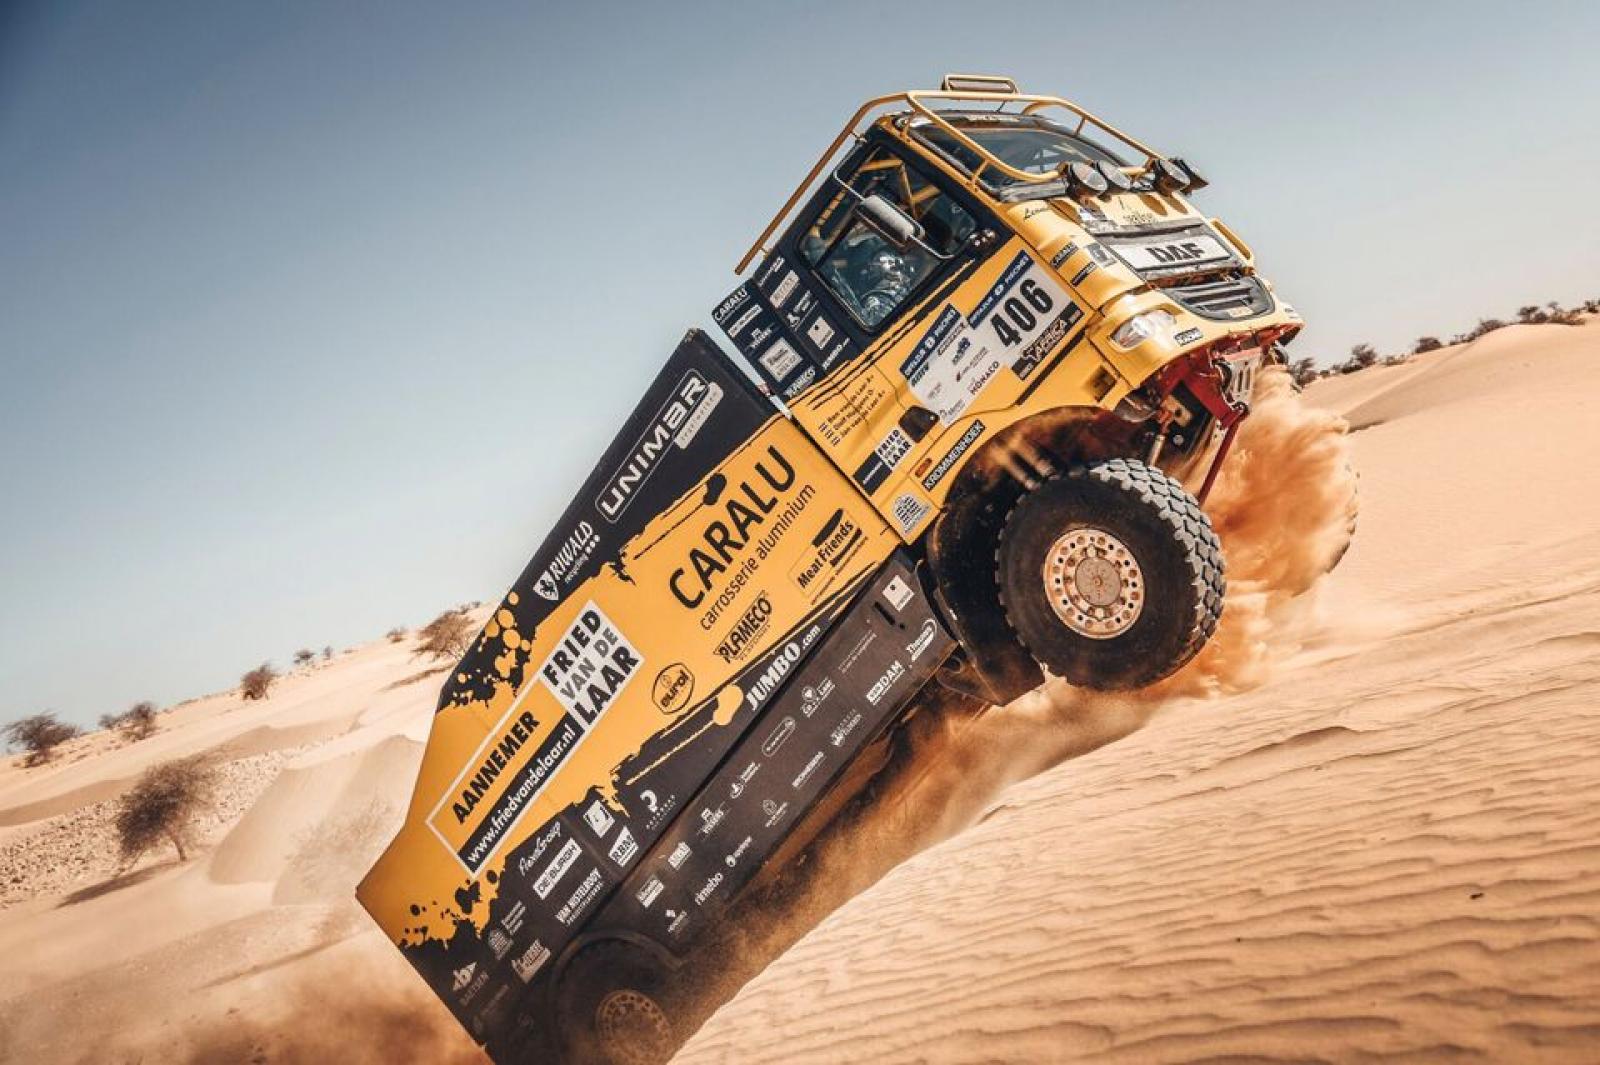 DAF Rally truck 2019 - 2